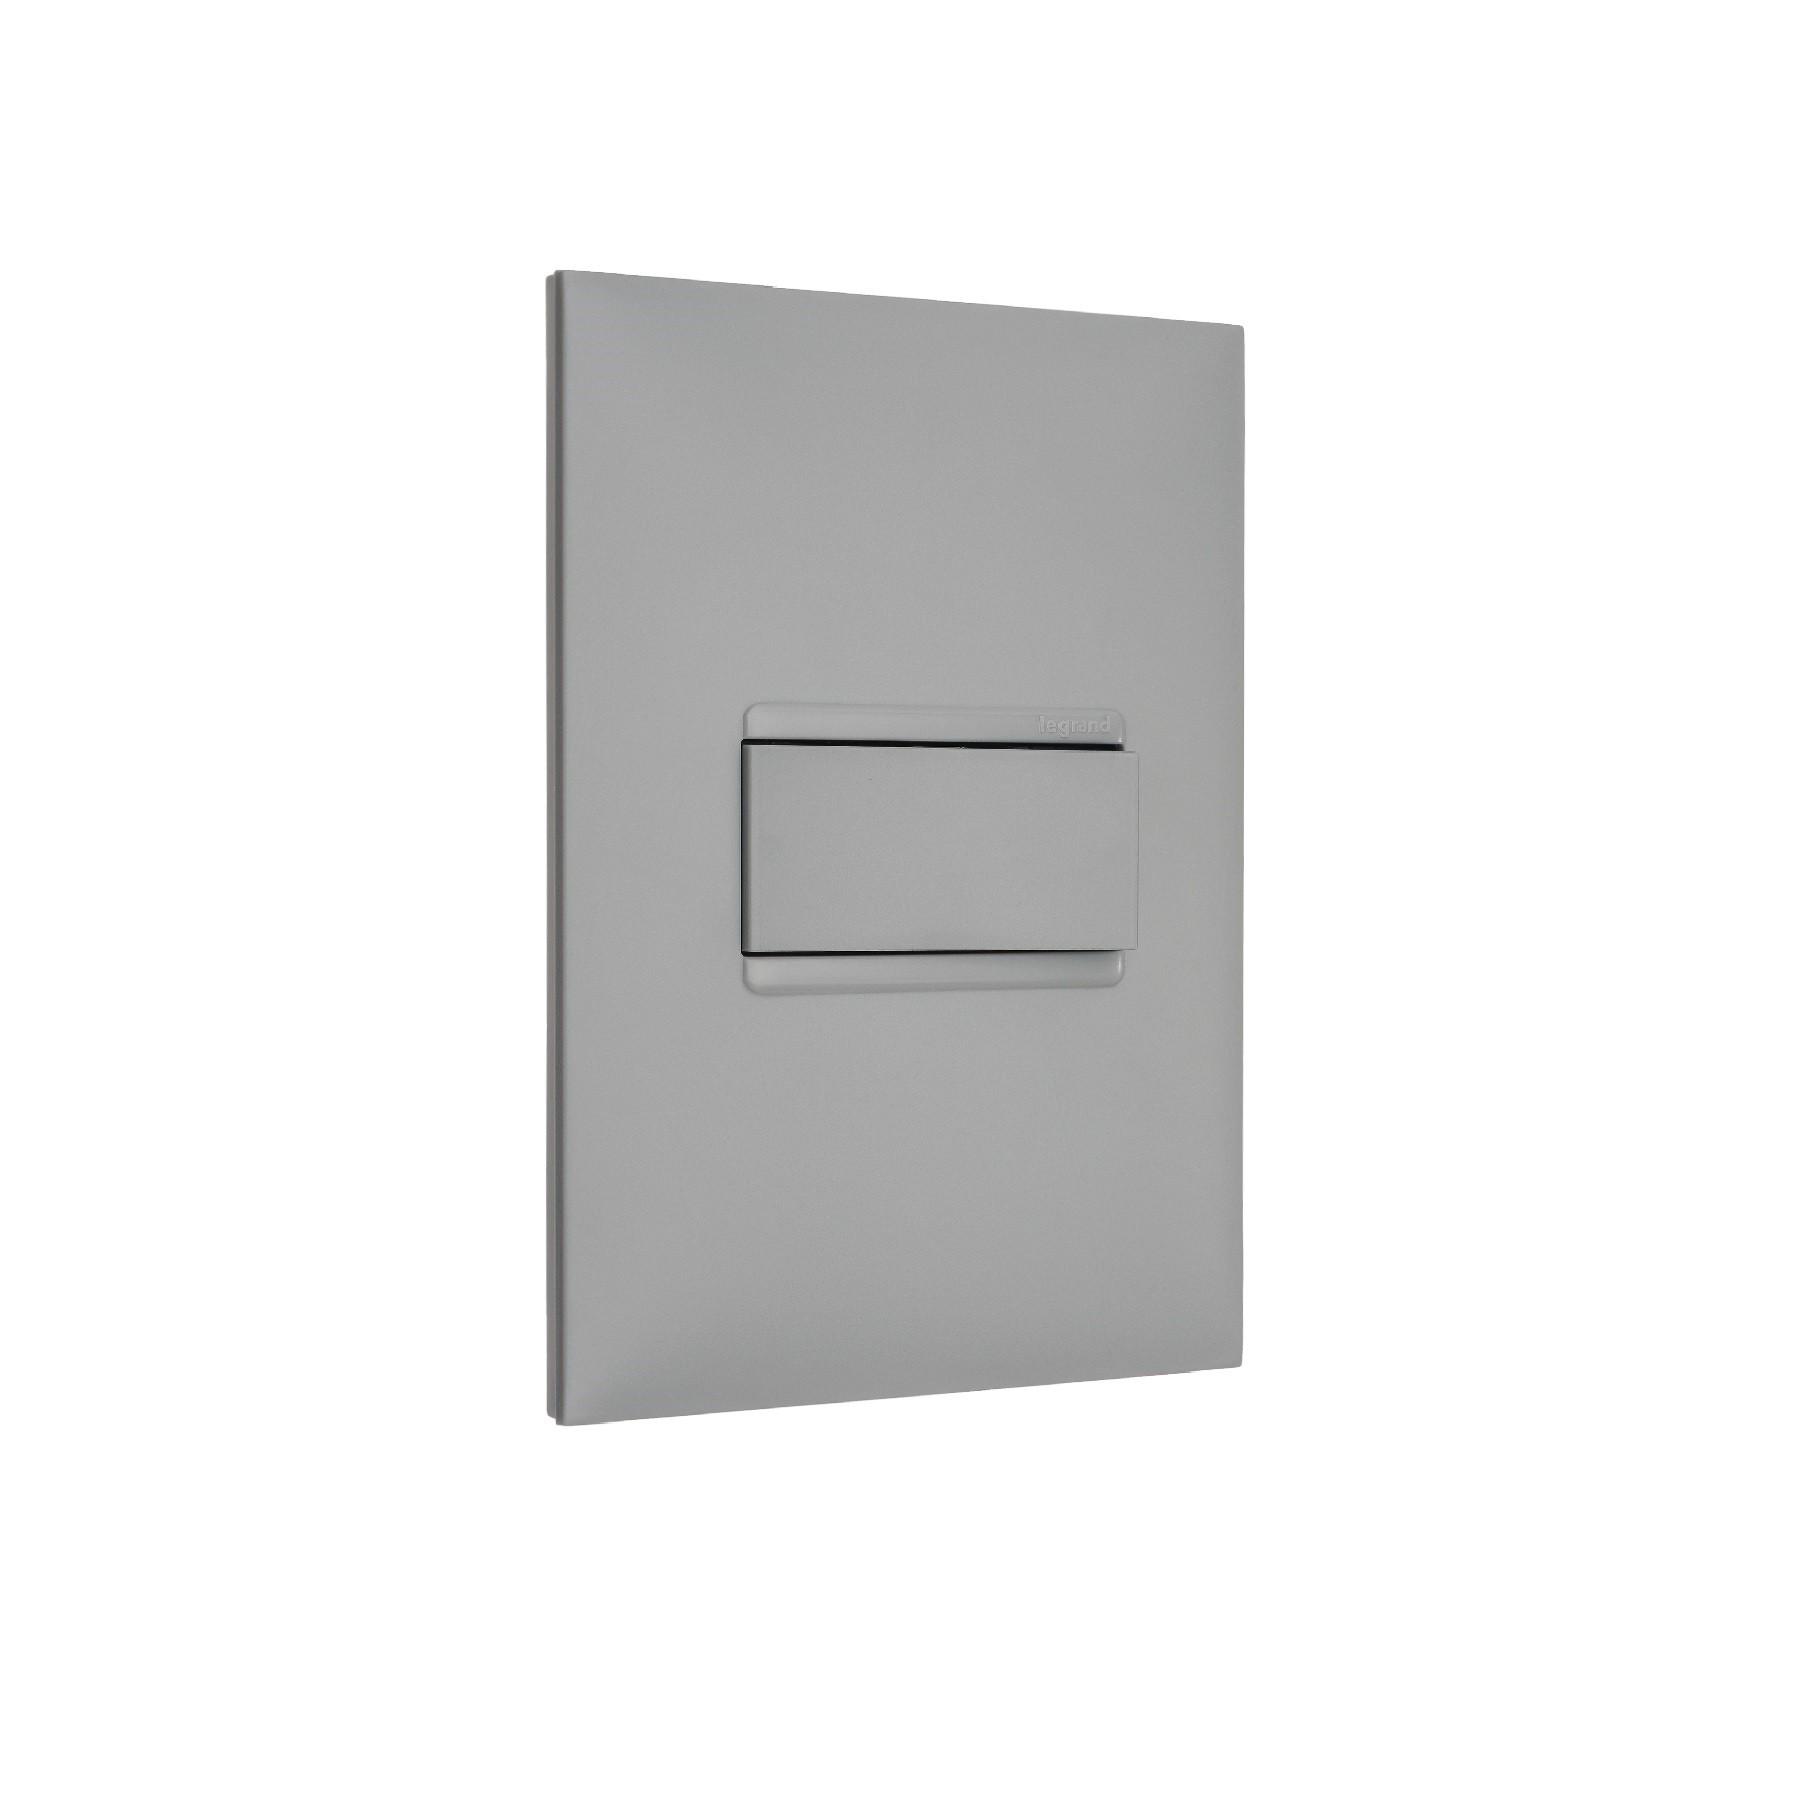 Modulo Interruptor Simples Alavanca 1 Modulo 10A - Cinza - Pial Plus - Legrand